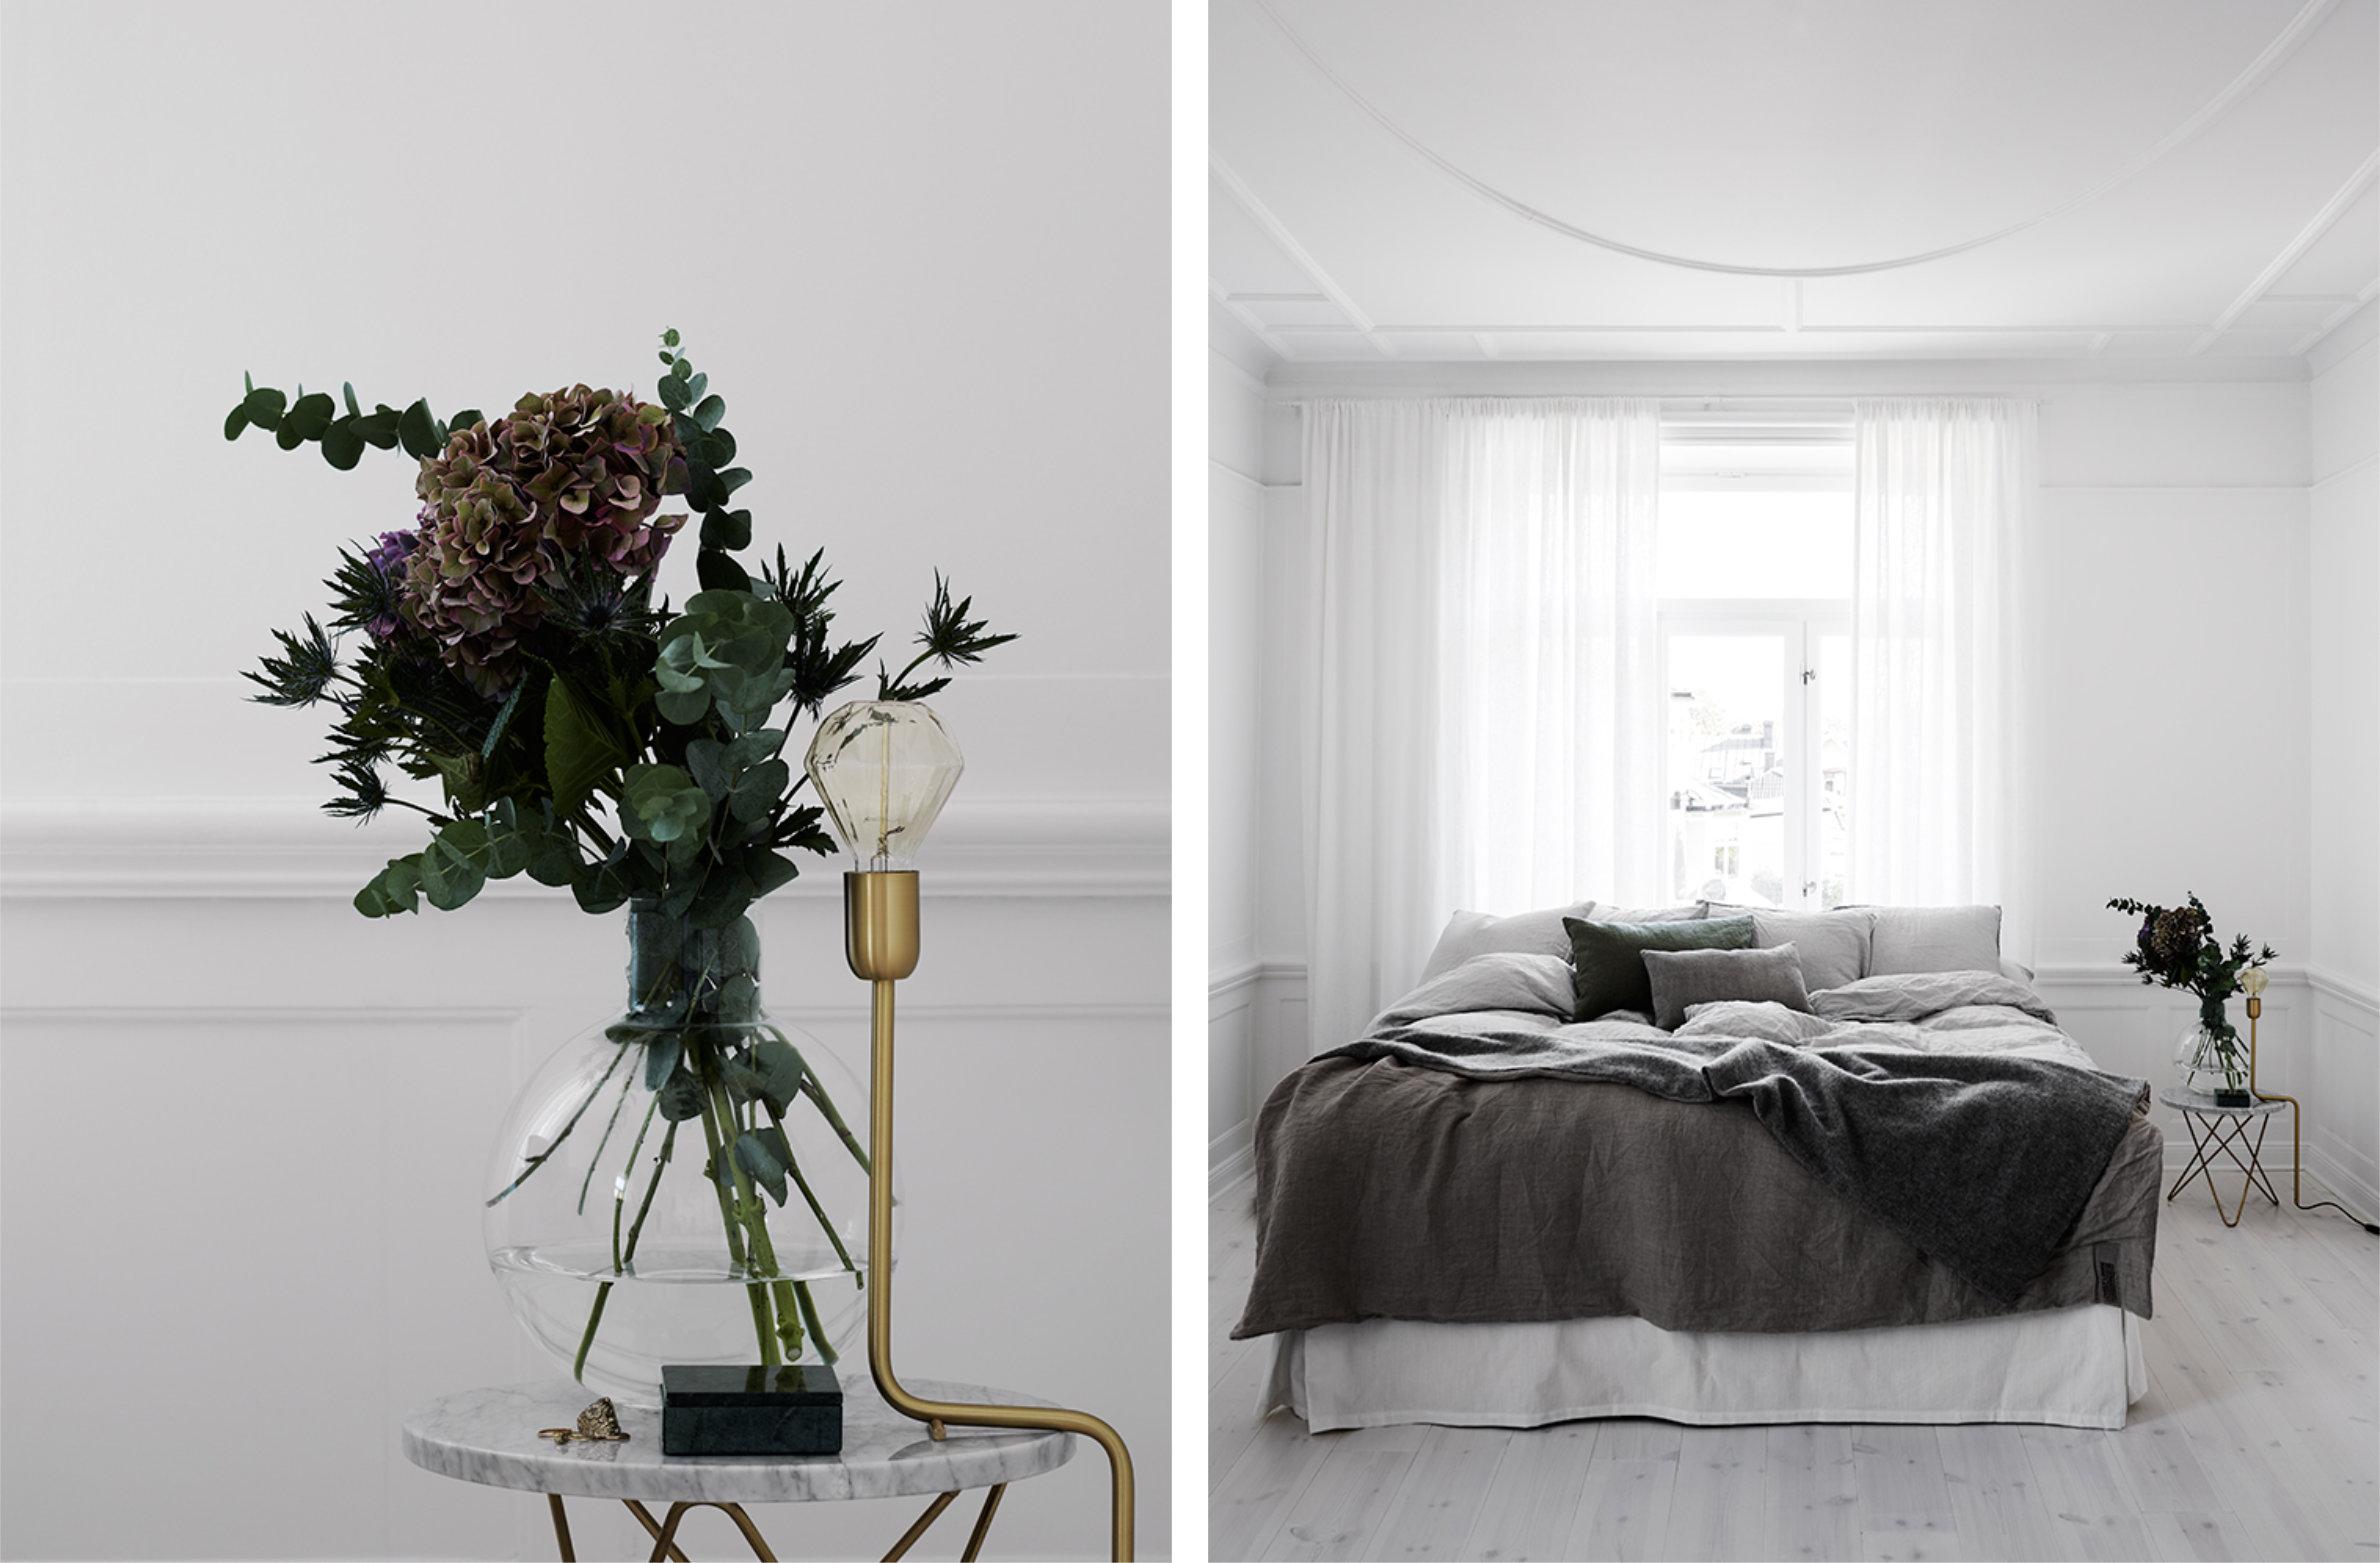 interiorlines_homestyling_sved_apartman2.jpg